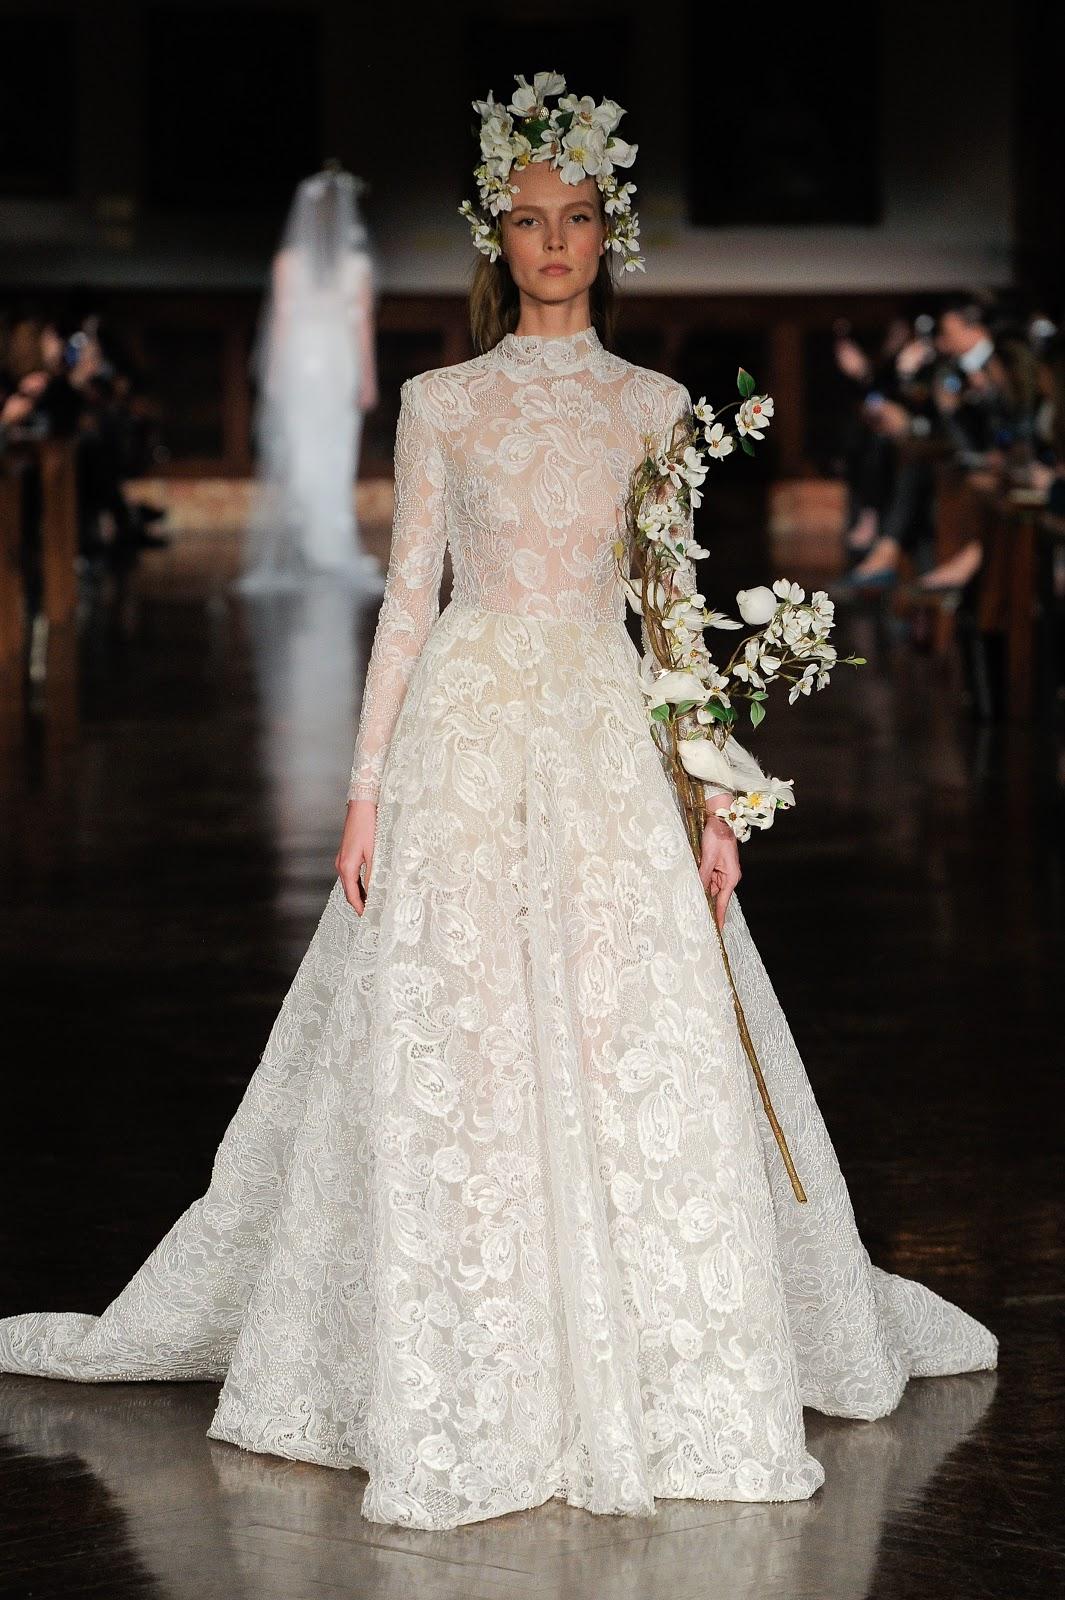 Reem Acra Bridal & Wedding Dress Spring 2019 New York | Cool Chic ...